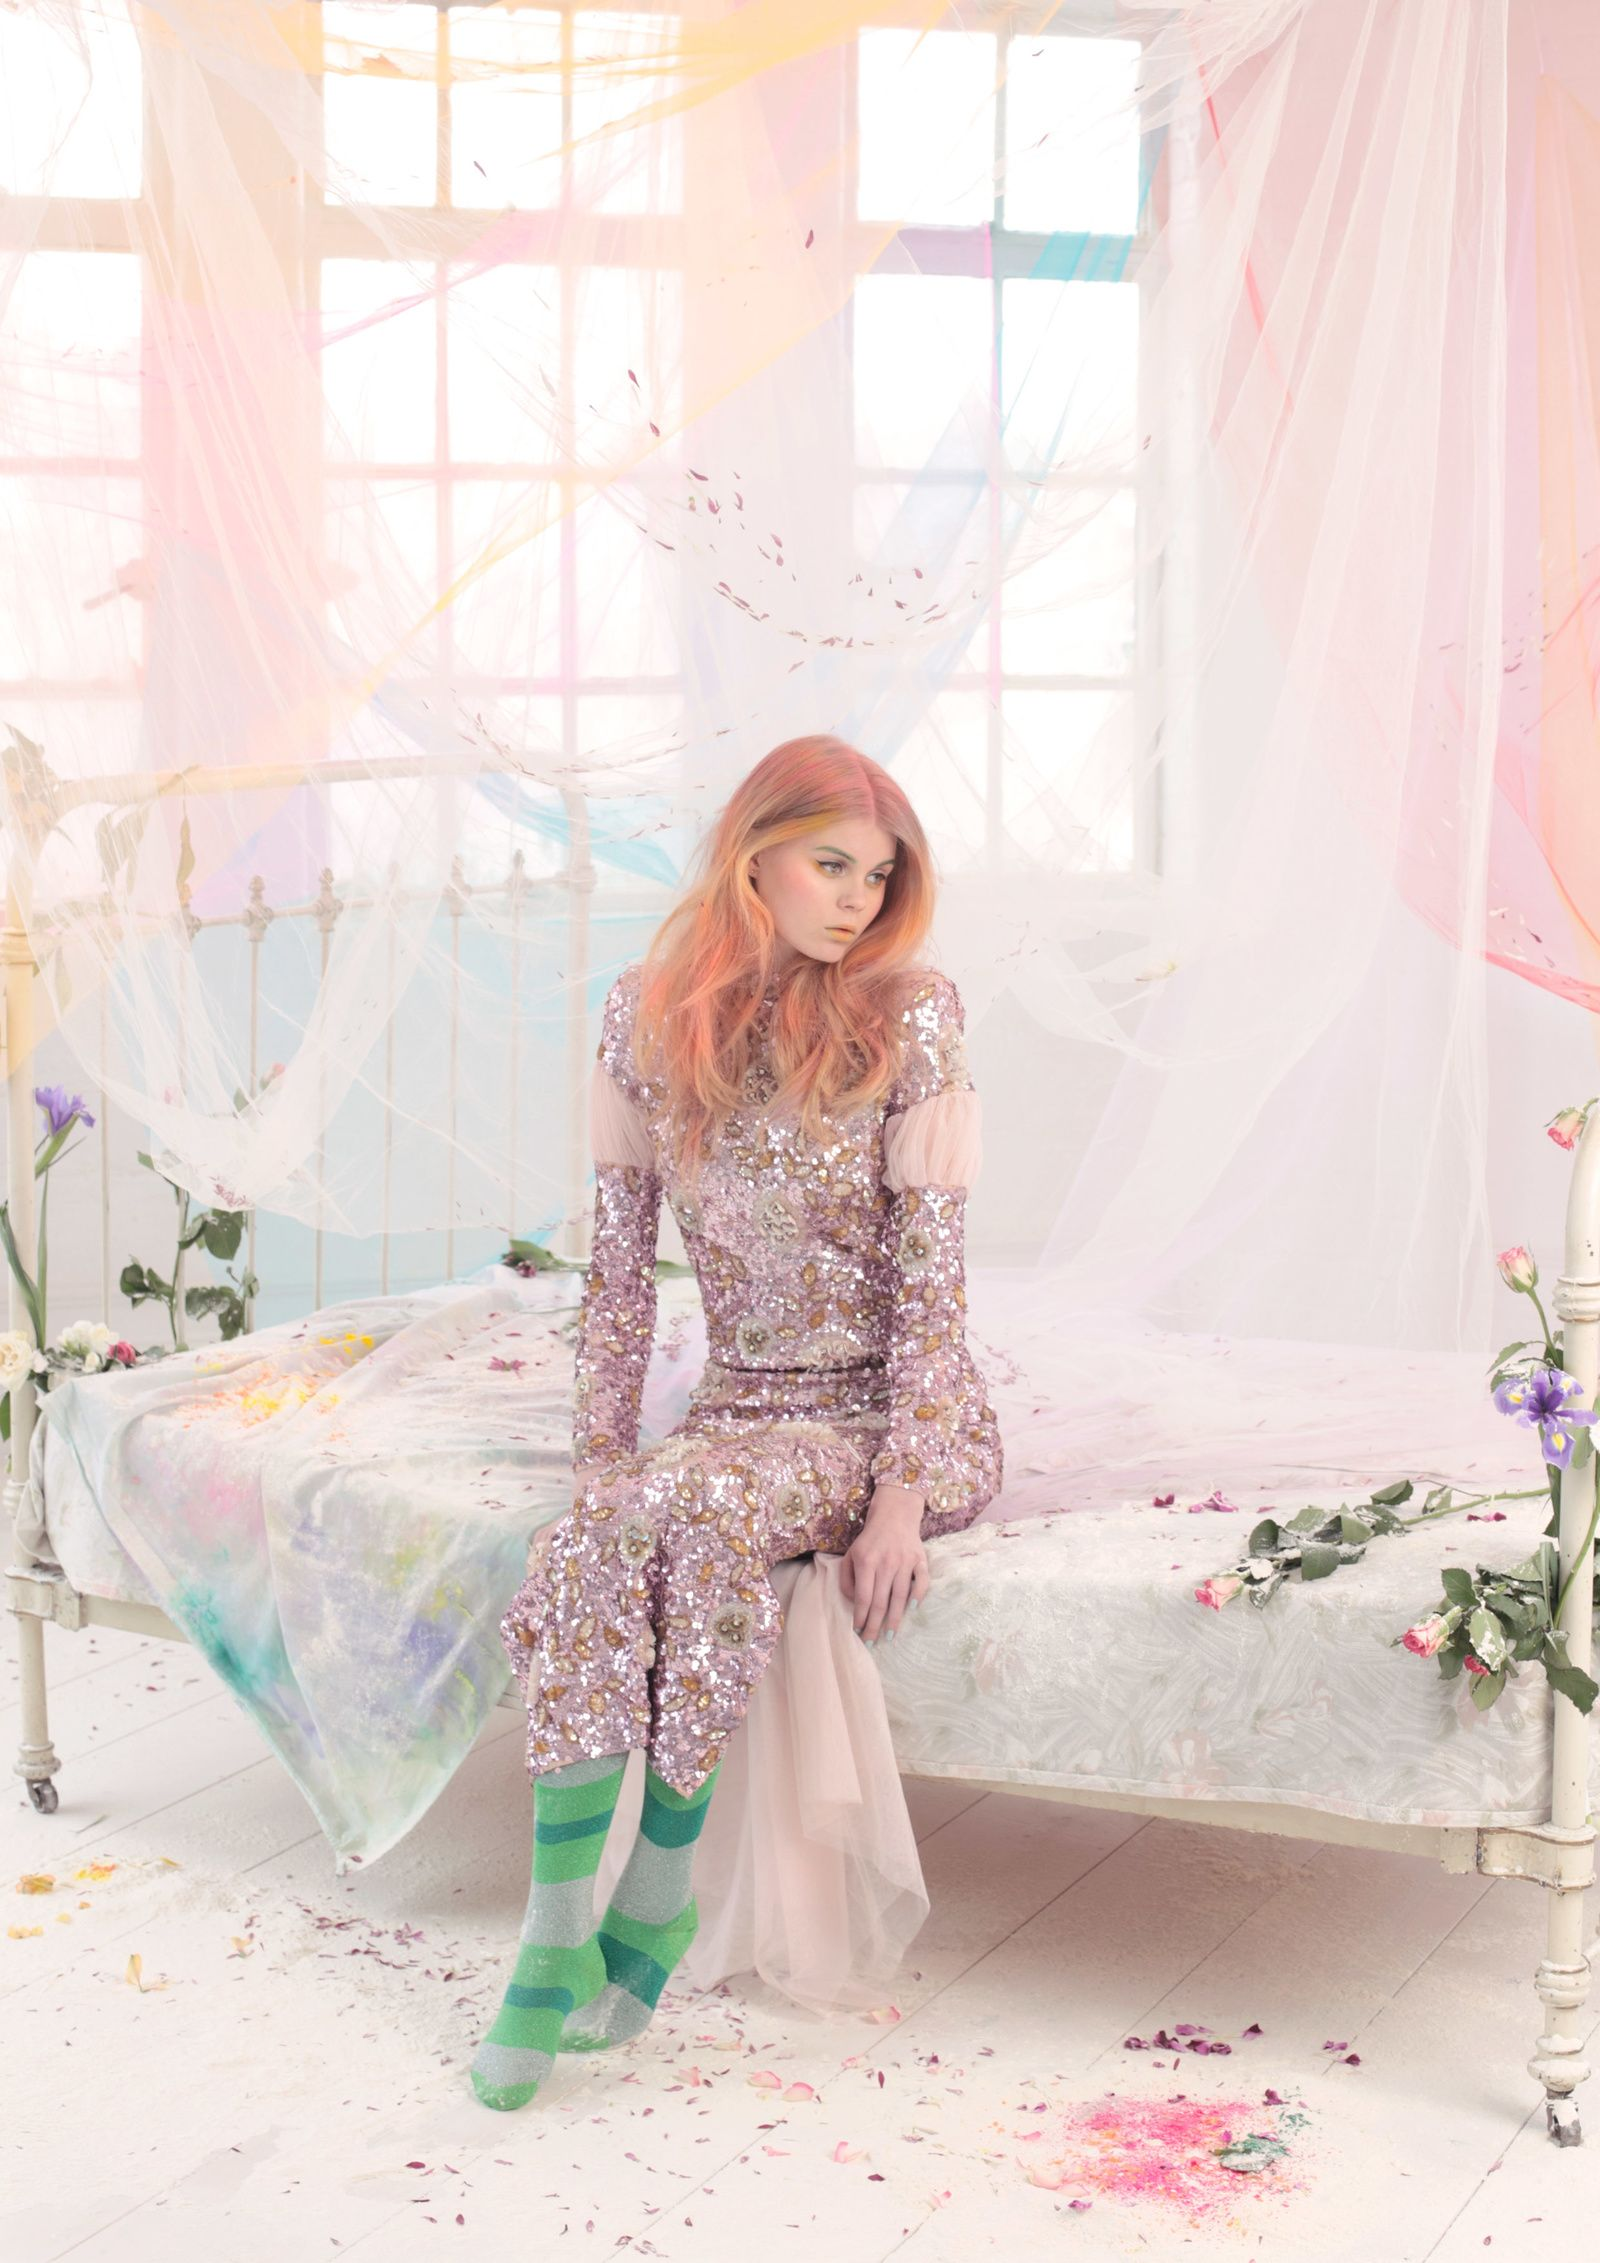 Eleanor Hardwick - Fashion